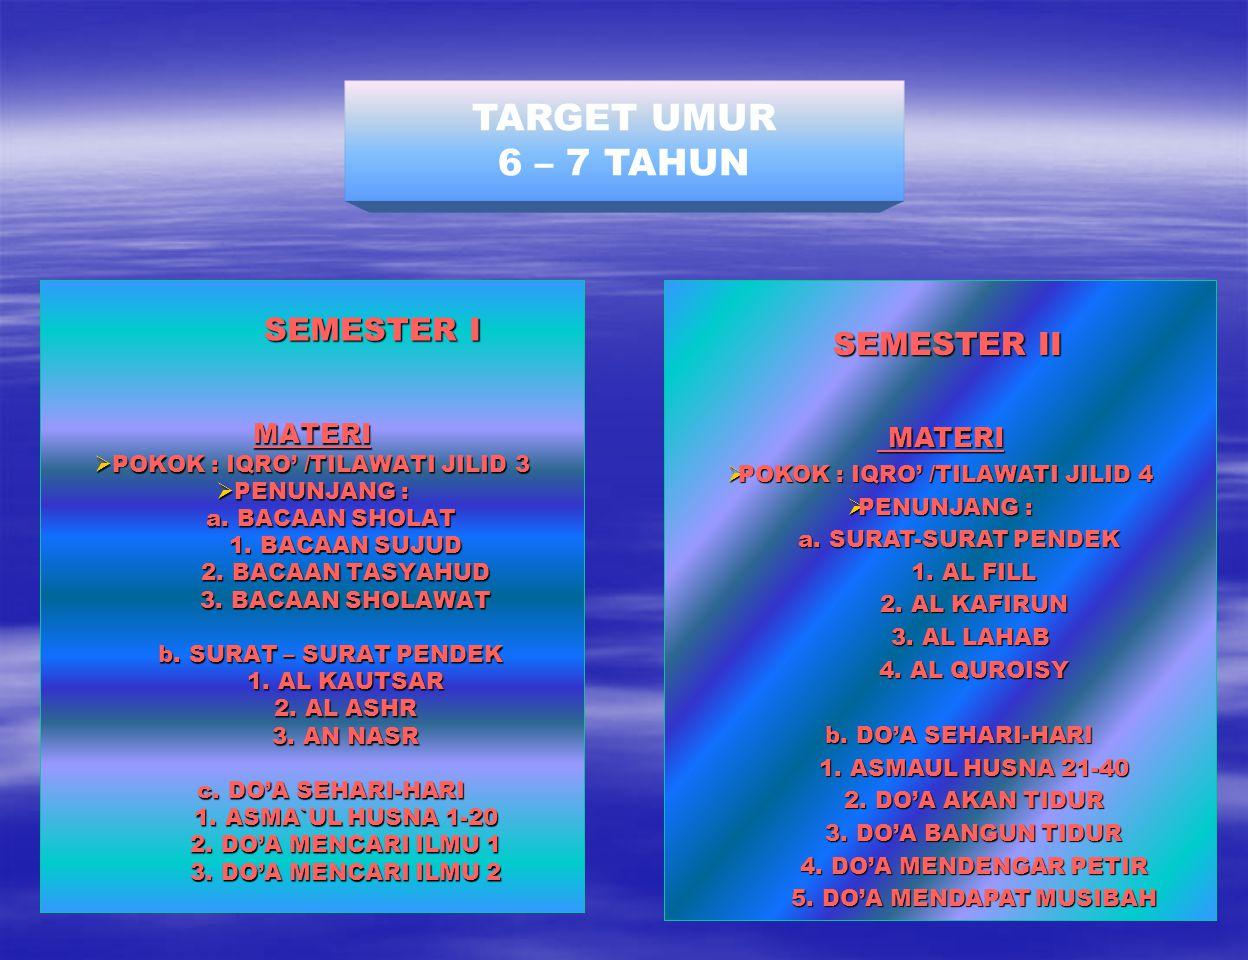 TARGET UMUR 6 – 7 TAHUN MATERI SEMESTER II MATERI SEMESTER I